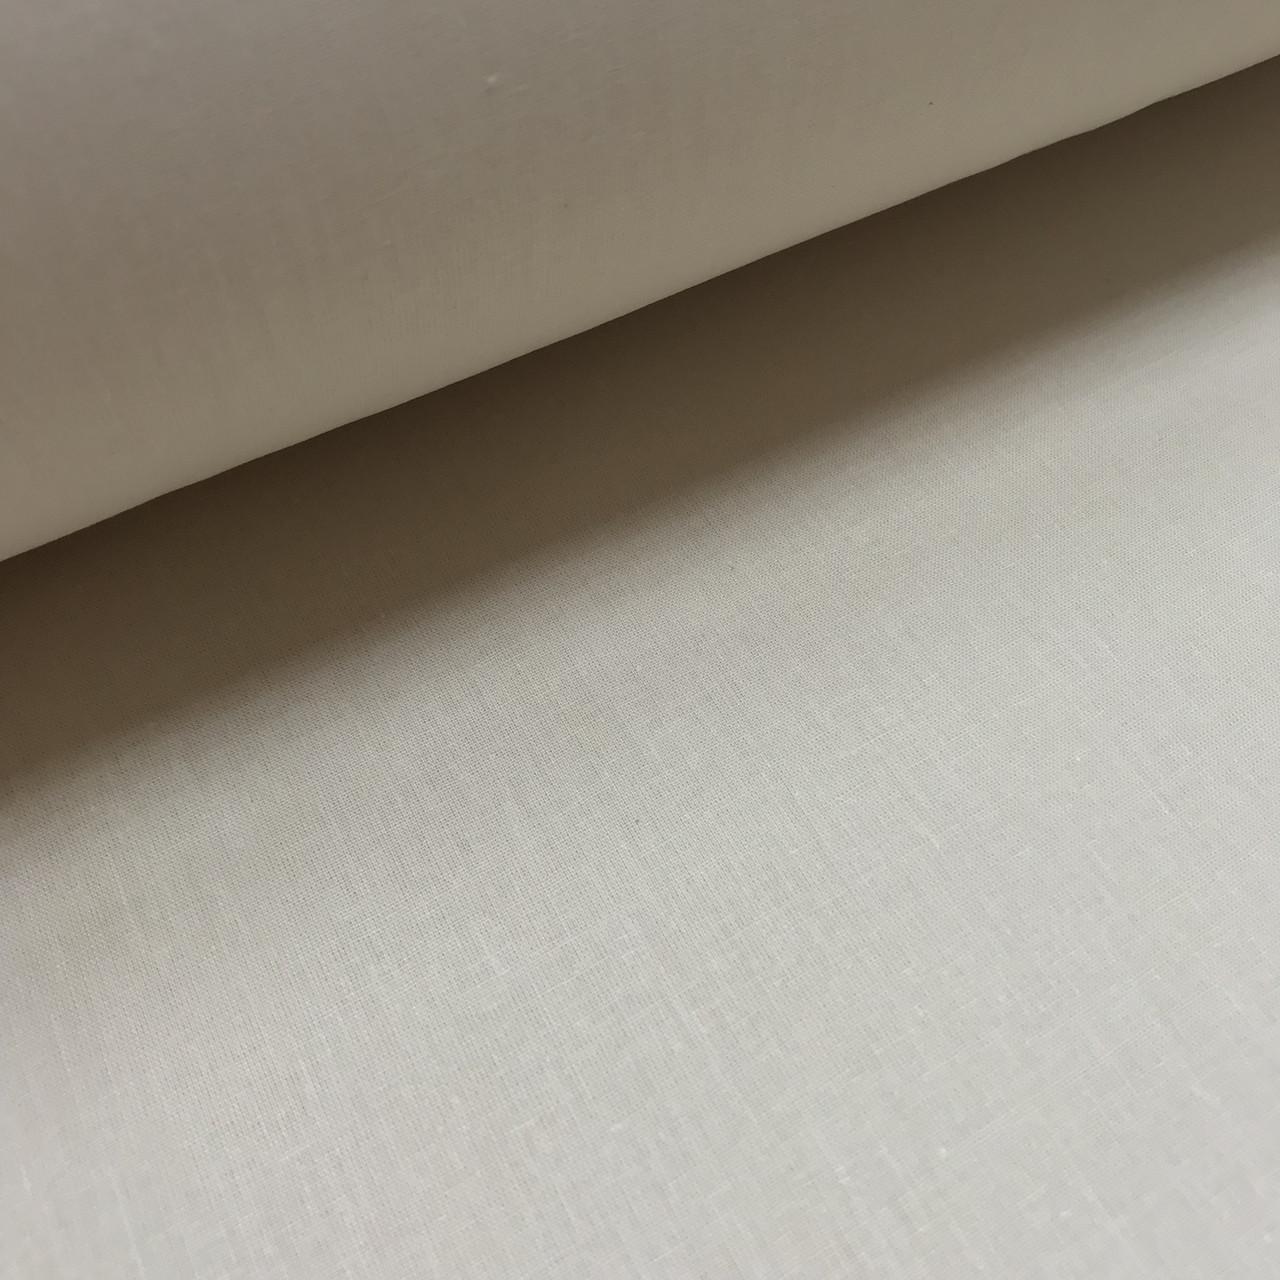 Ткань поплин De Luxe, однотонный бежевый (шир. 2,4 м) №32-15b